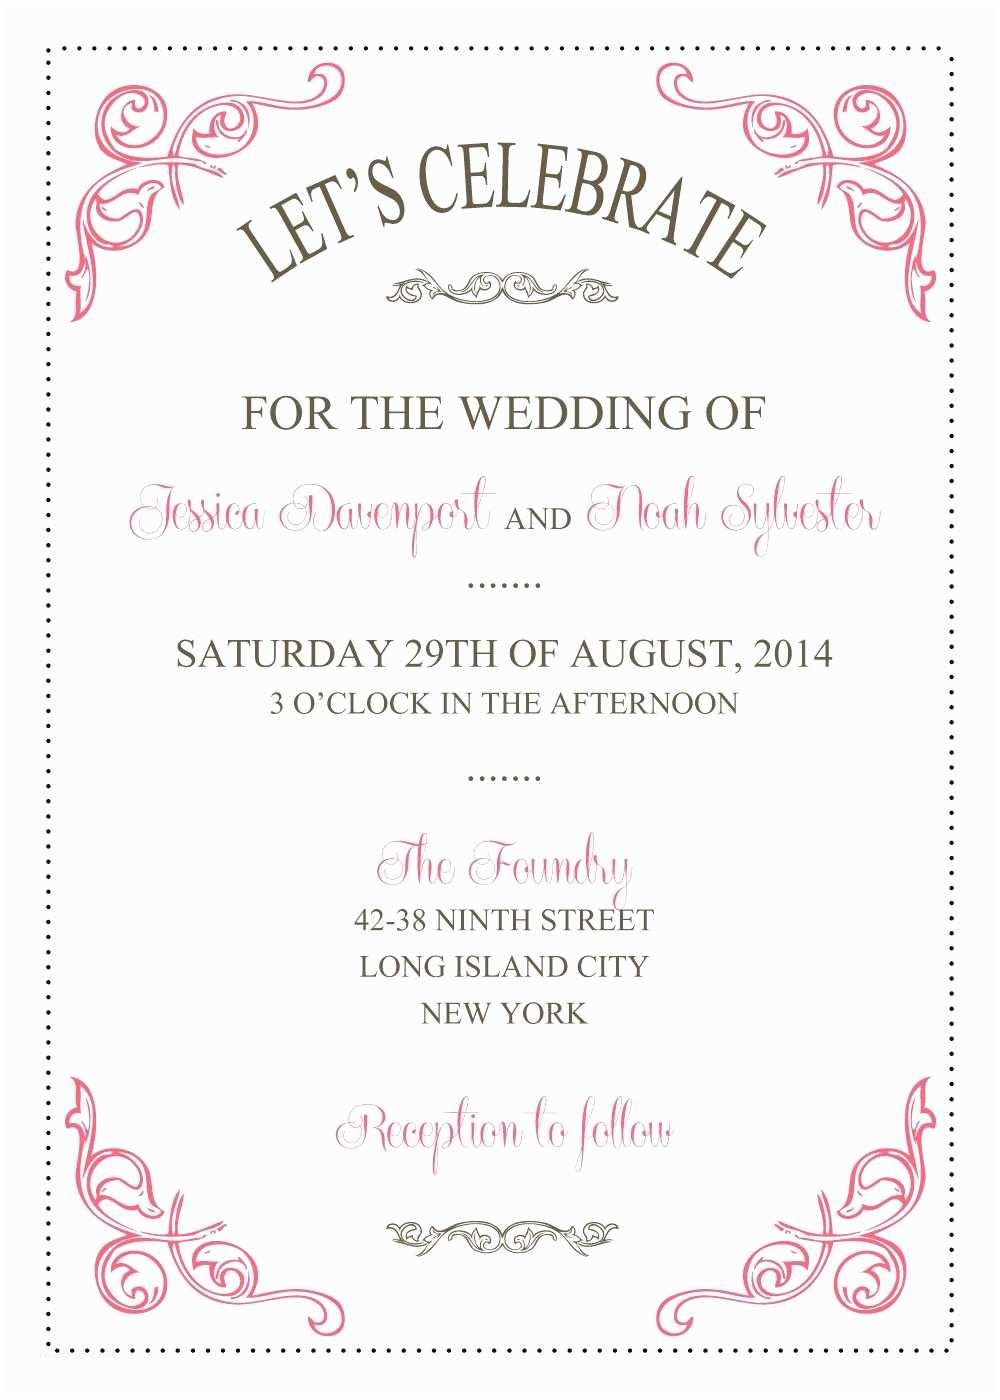 Wedding Invitation Samples Free Templates Wedding Invitations Template Wedding Invitations